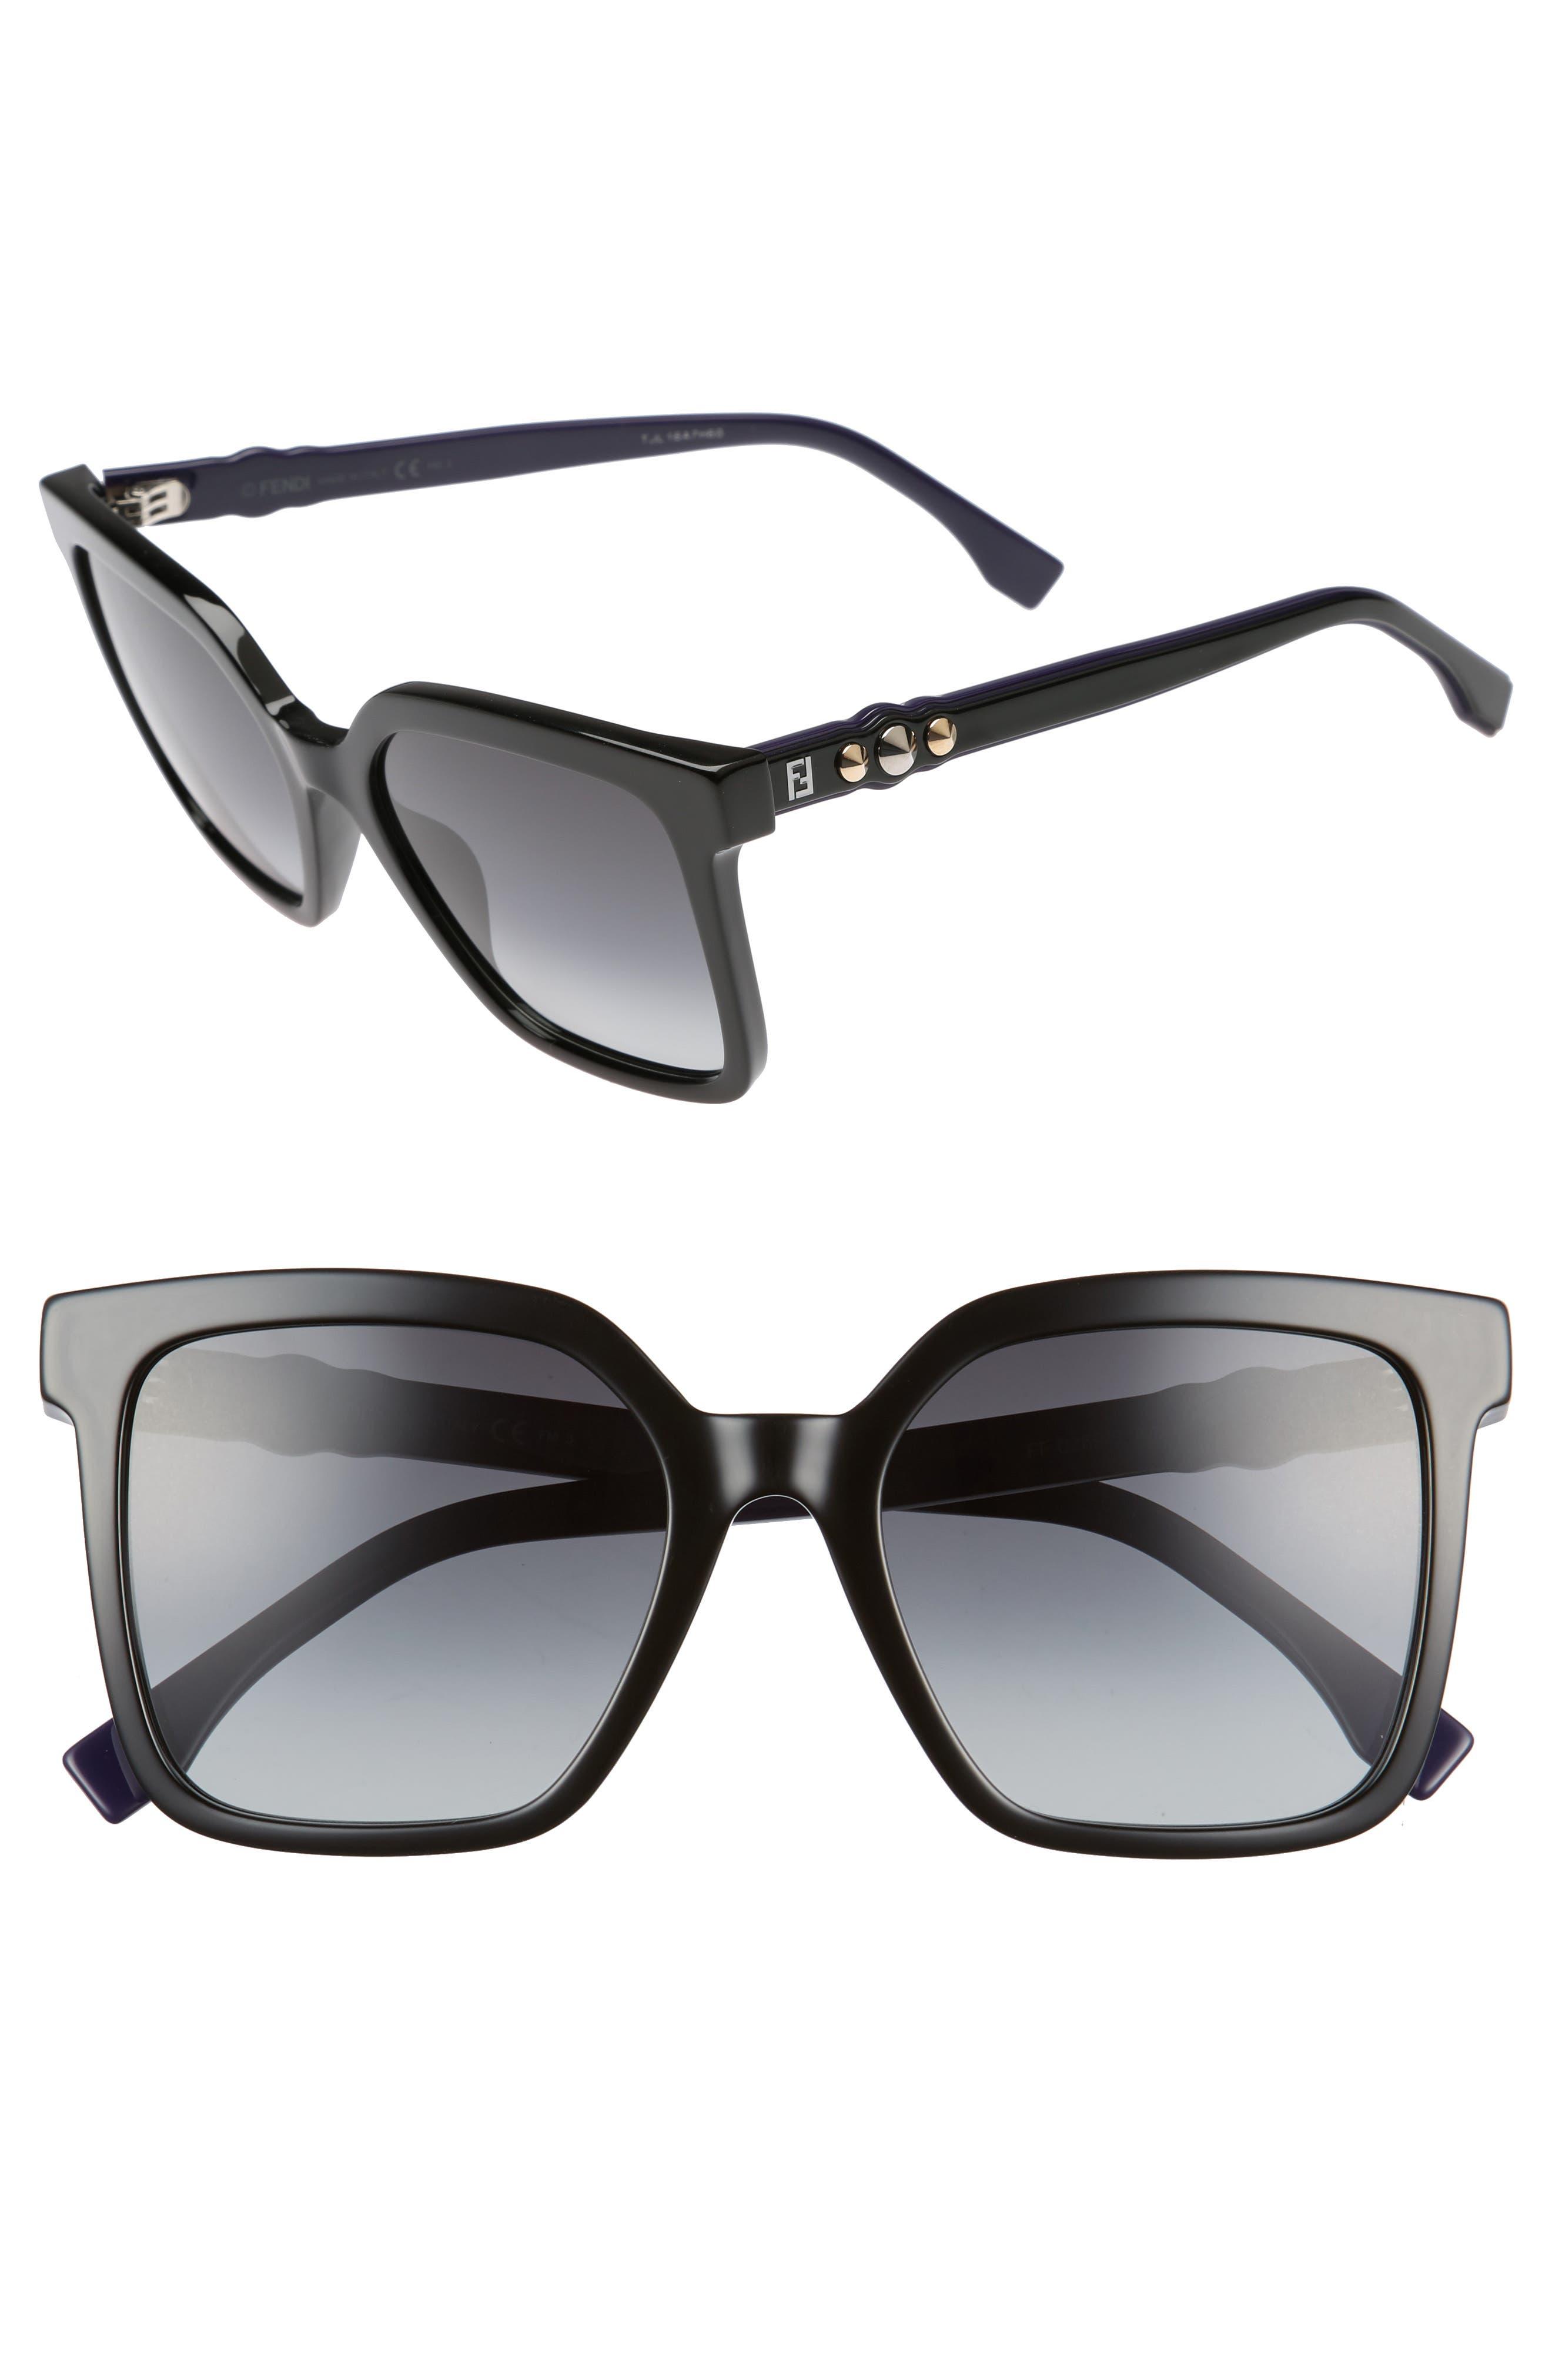 54mm Square Sunglasses,                         Main,                         color, Black